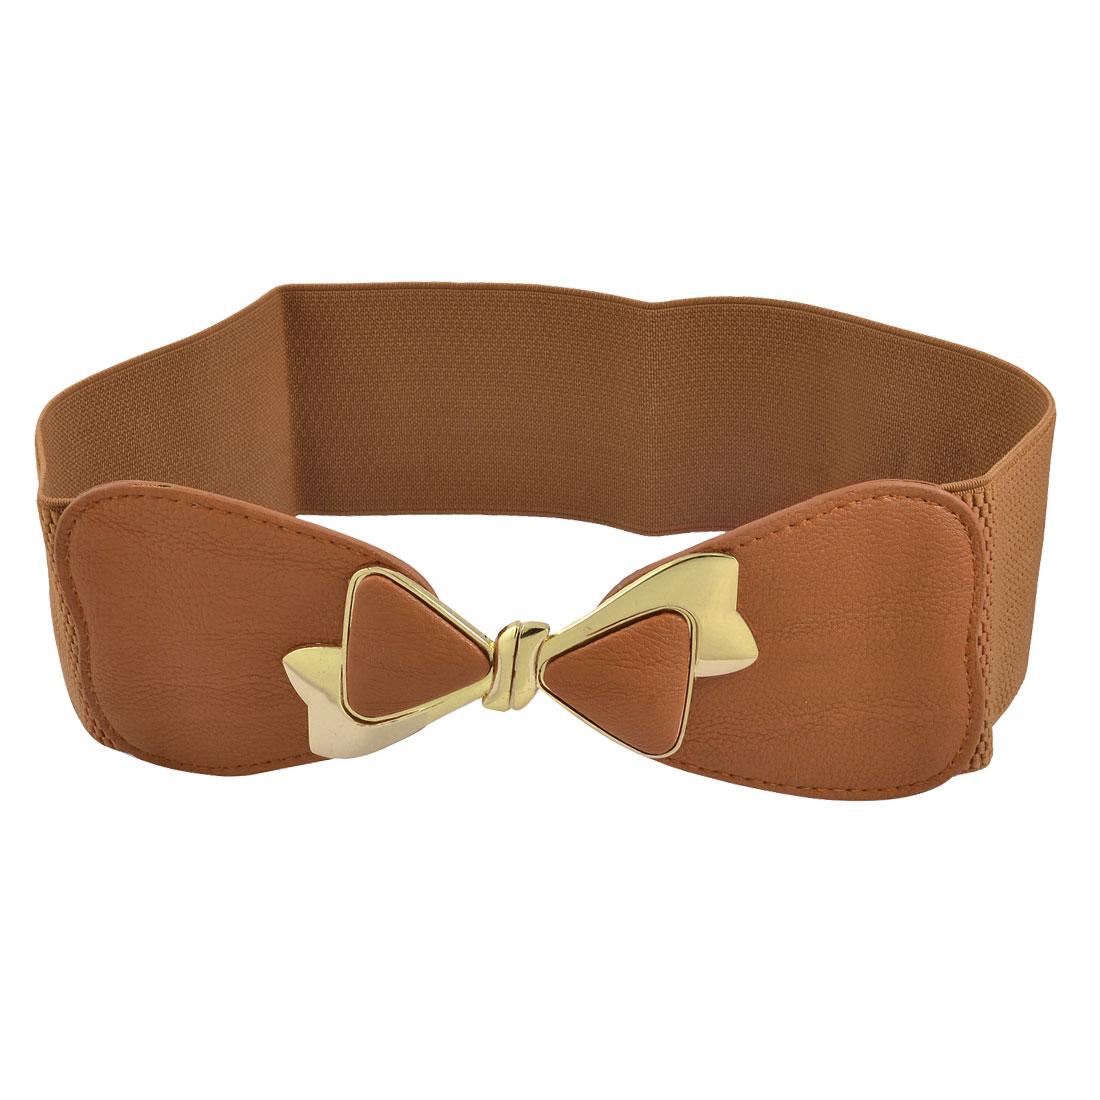 Woman Gold Tone Bowknot Buckle Brown Elastic Cinch Belt